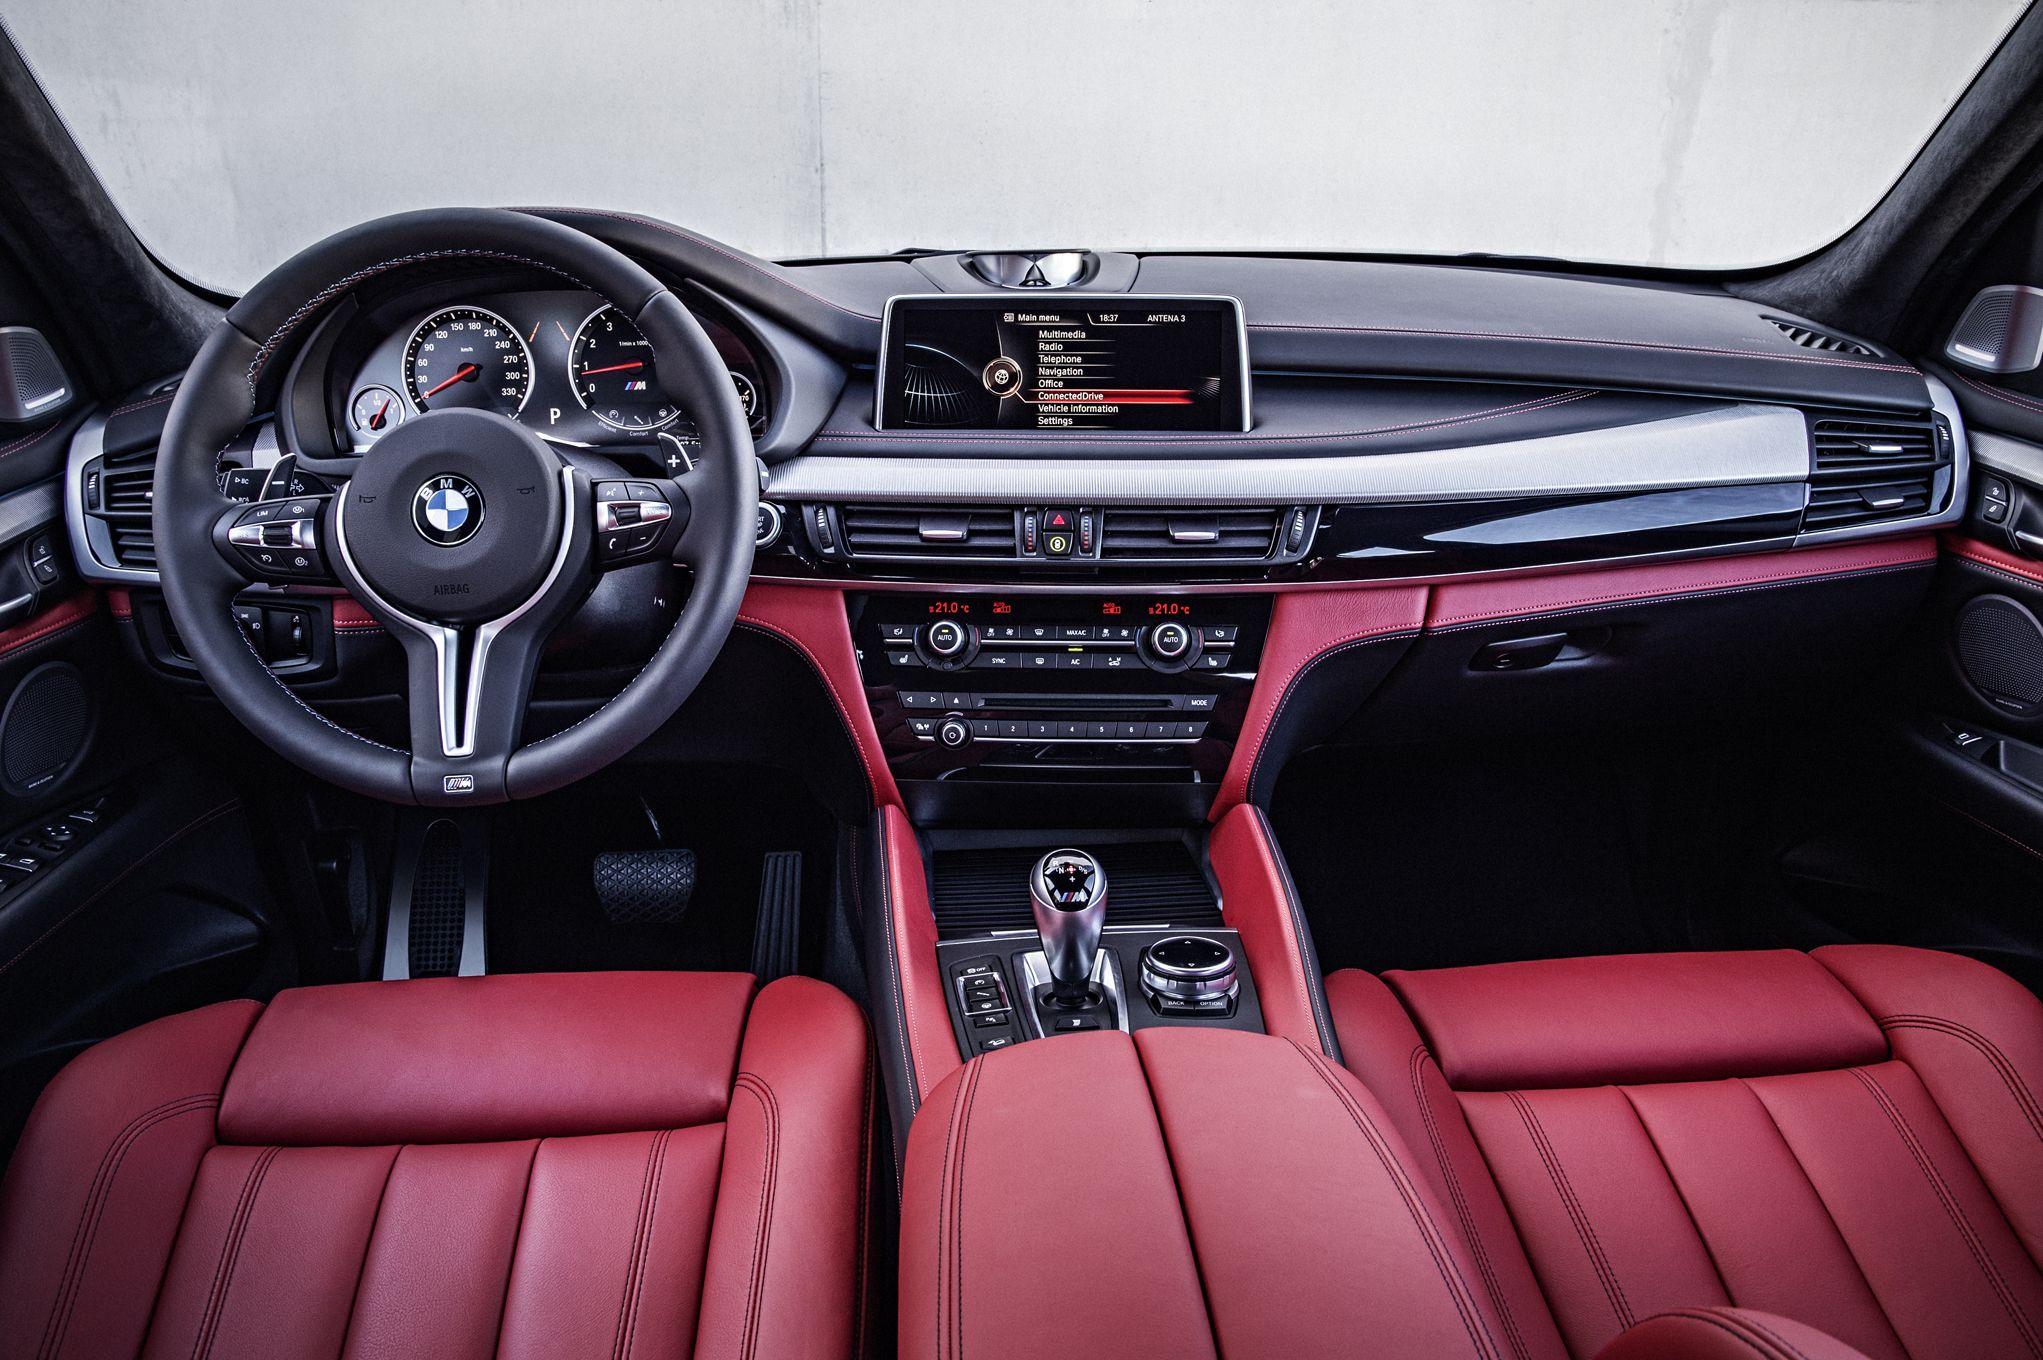 2015 bmw x5 m interior view